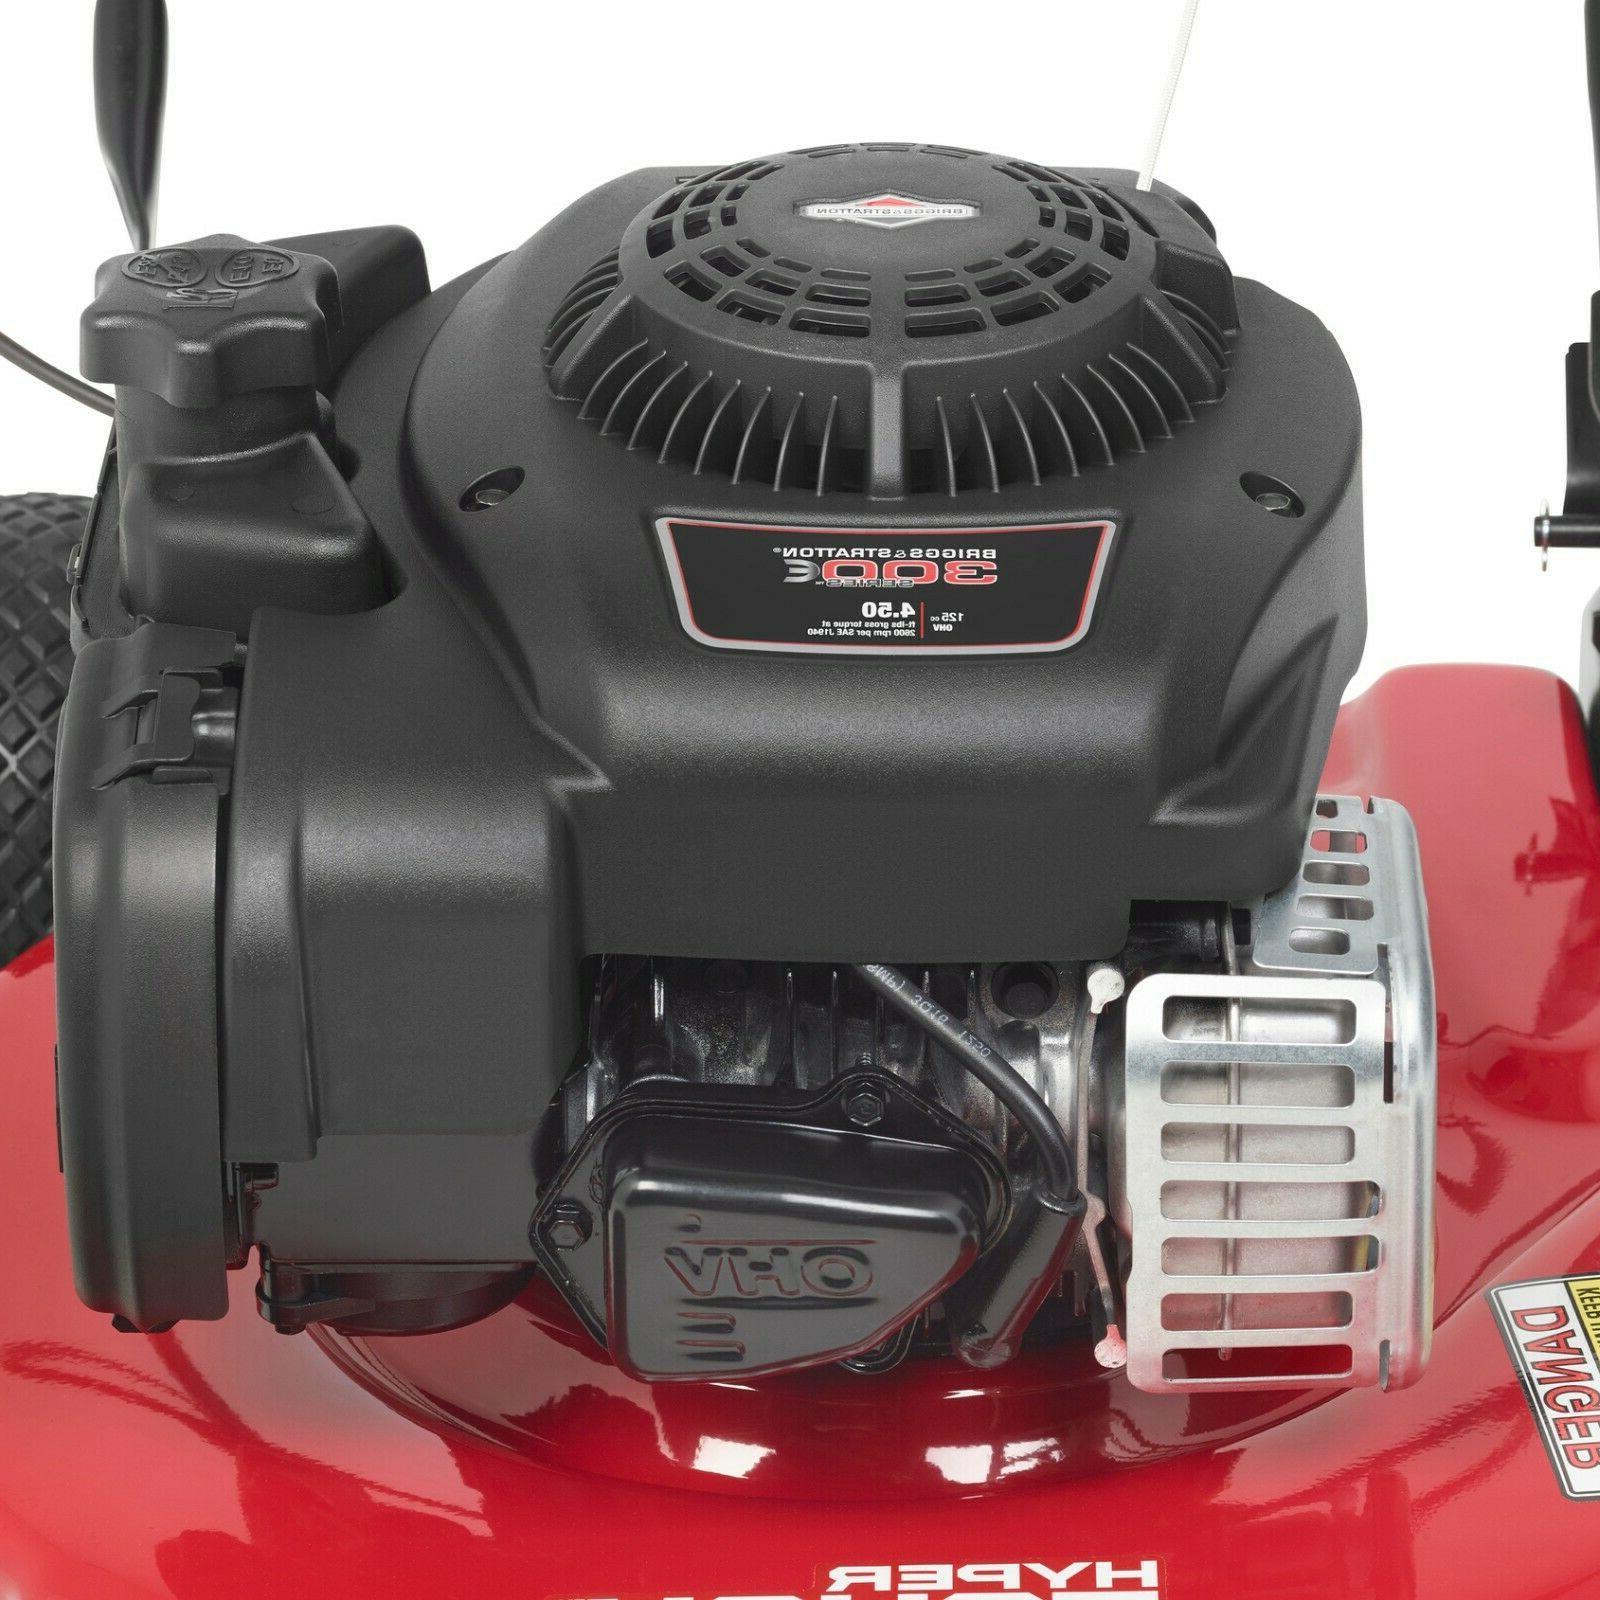 "Lawn Briggs Stratton 20"" 125cc Push Discharge Mower"